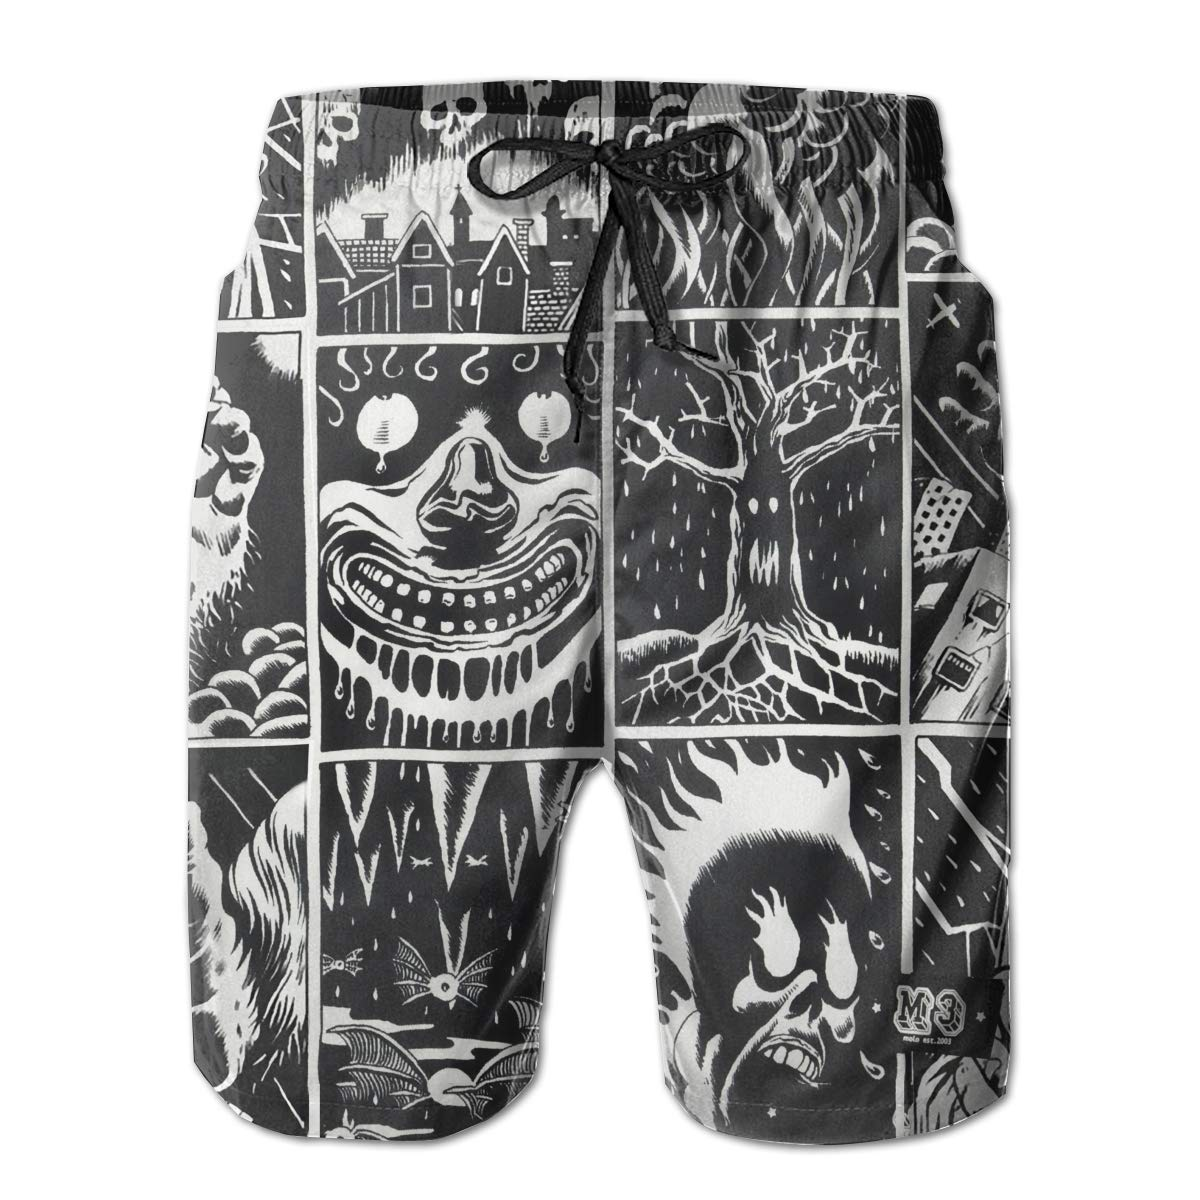 Halloween Swag Animal Skull Mens Swim Trunks Board Beachwear Casual Beach Shorts for Men with Mesh Lining